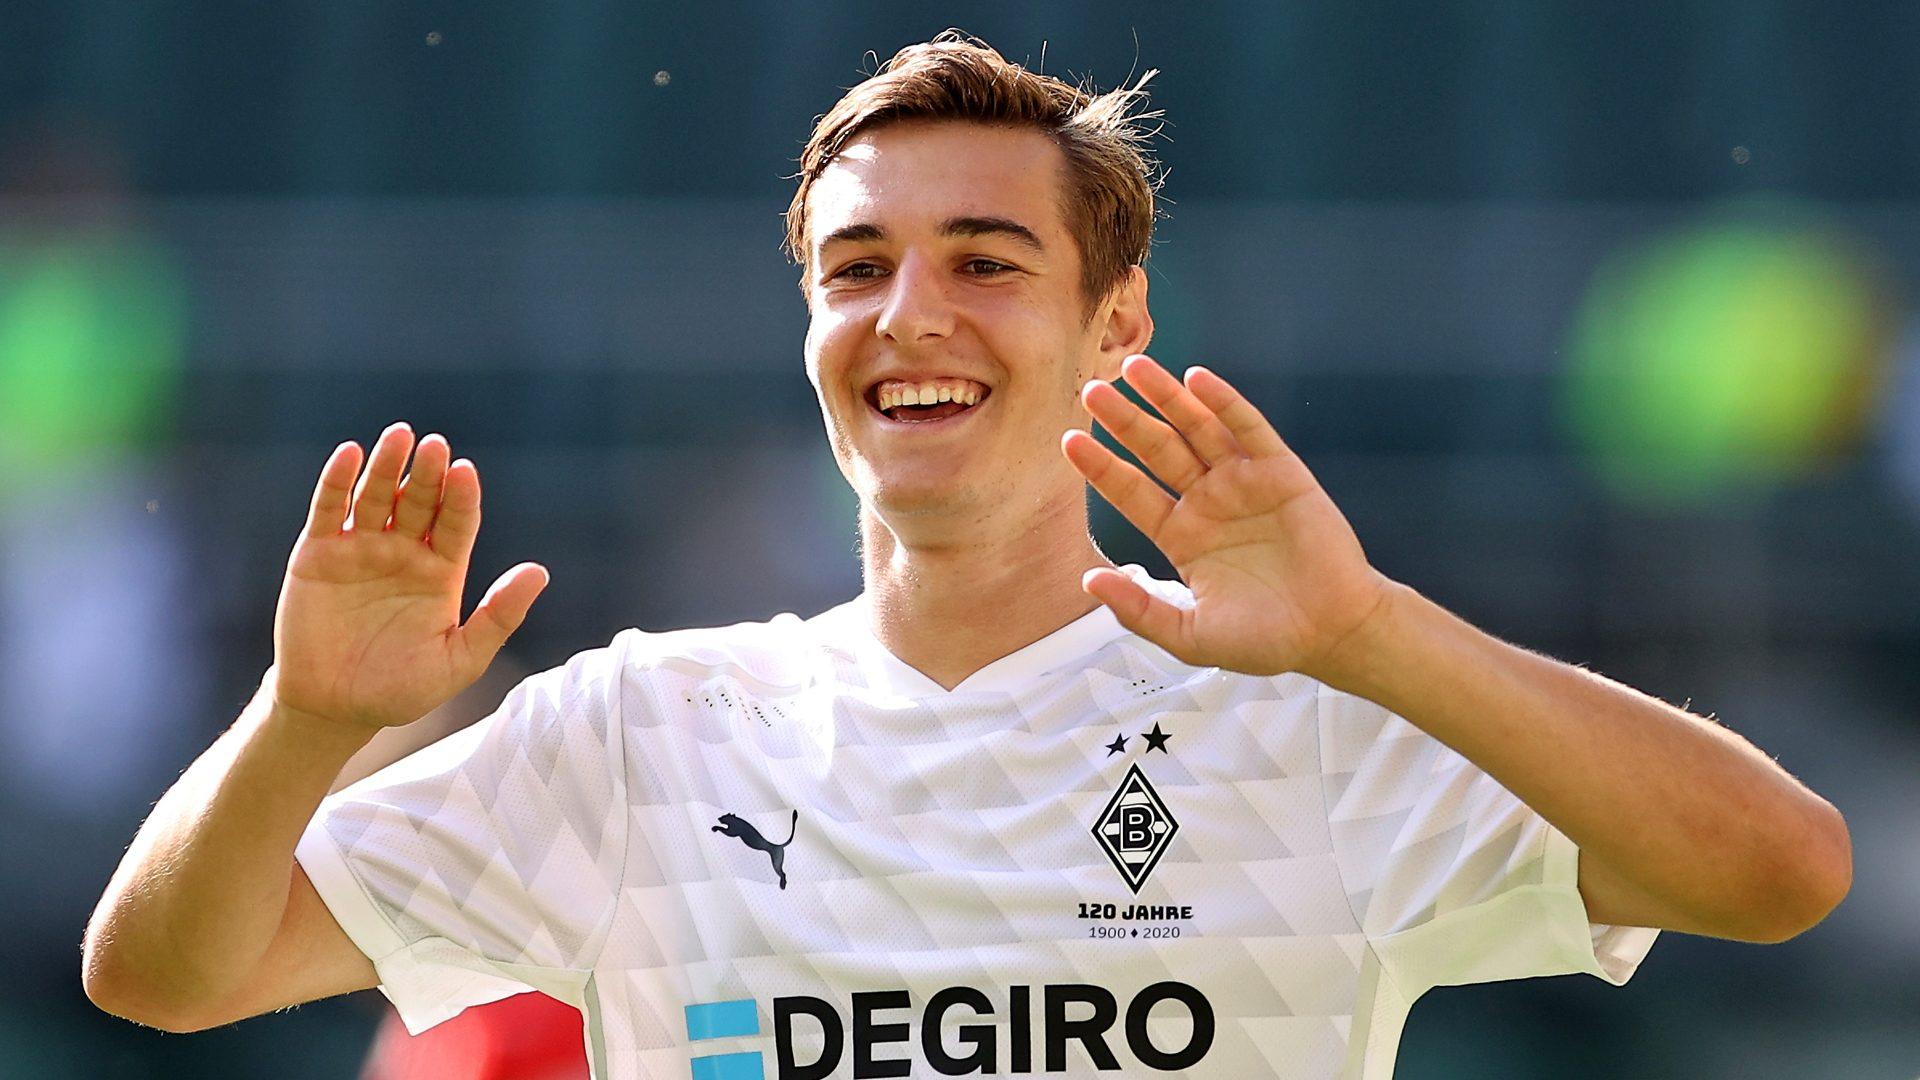 Bundesliga | Florian Neuhaus on his journey to Borussia Mönchengladbach,  dreaming of playing for Germany and scoring long-range goals